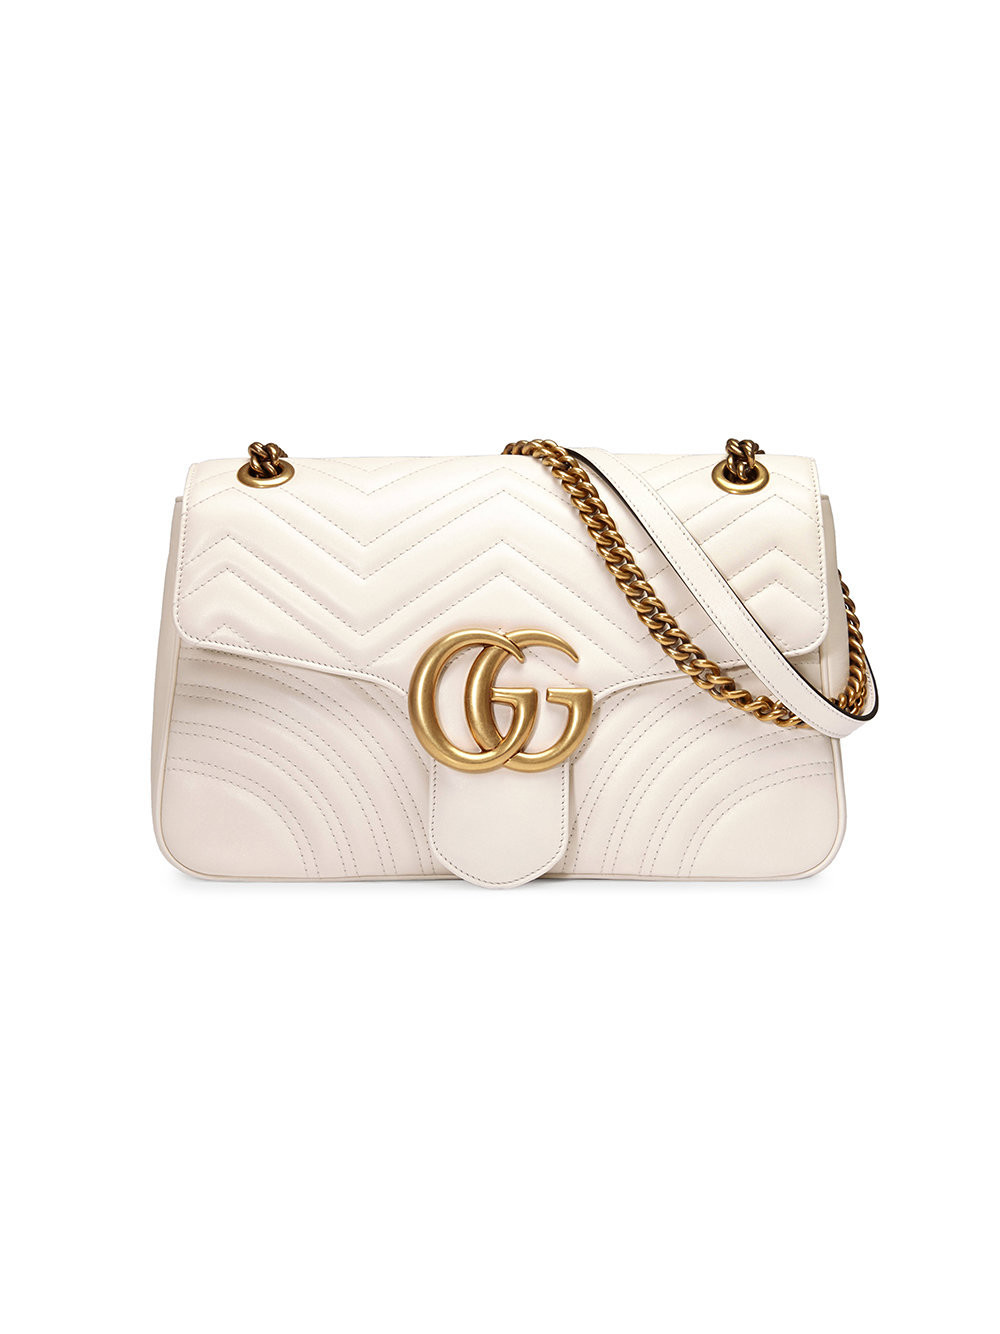 Deals on Gucci GG Marmont matelassé shoulder bag - Nude & Neutrals